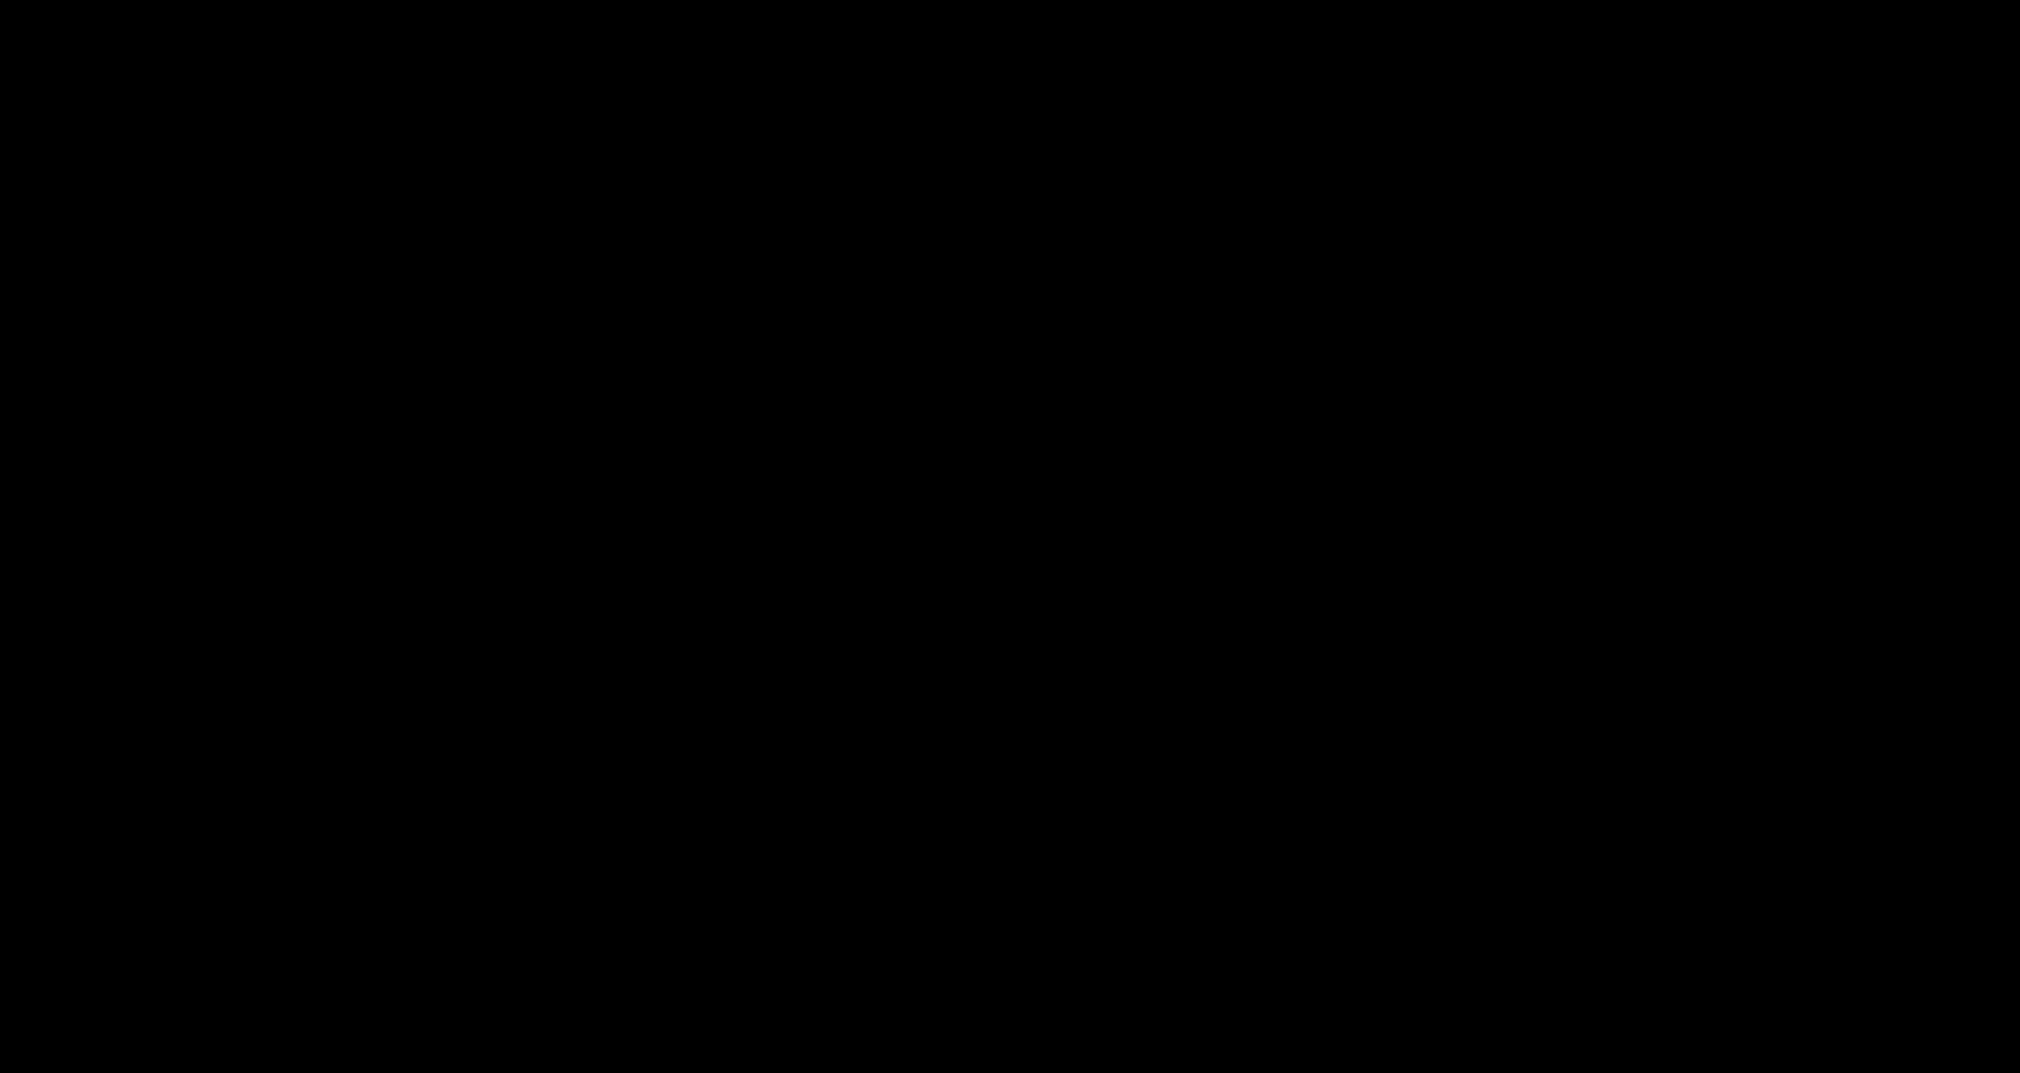 graph2-1s